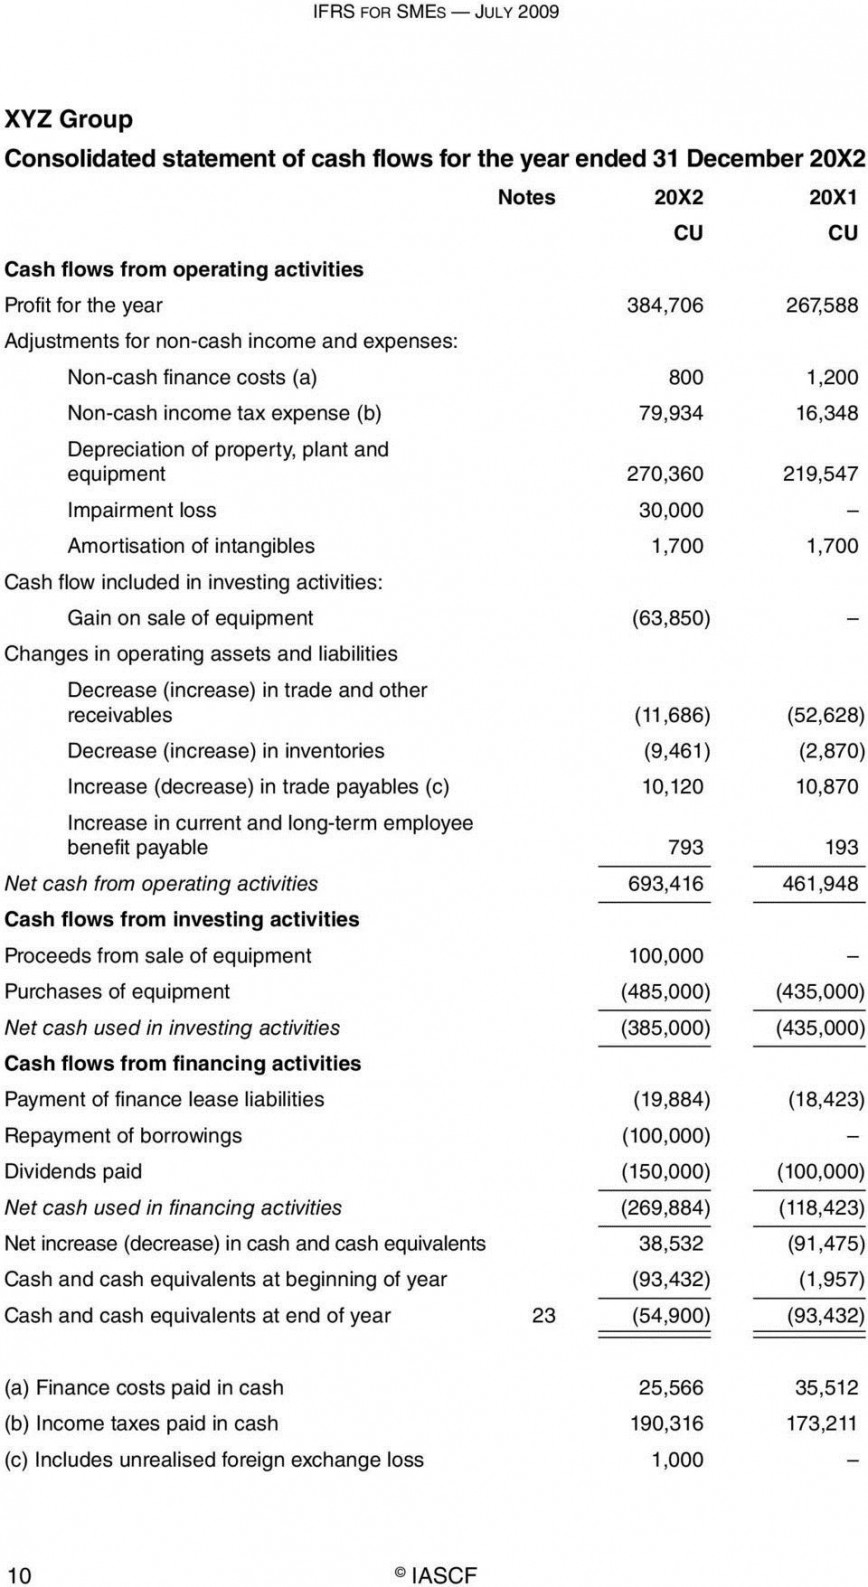 008 Unbelievable Statement Of Cash Flow Template Ifr Design  Excel868